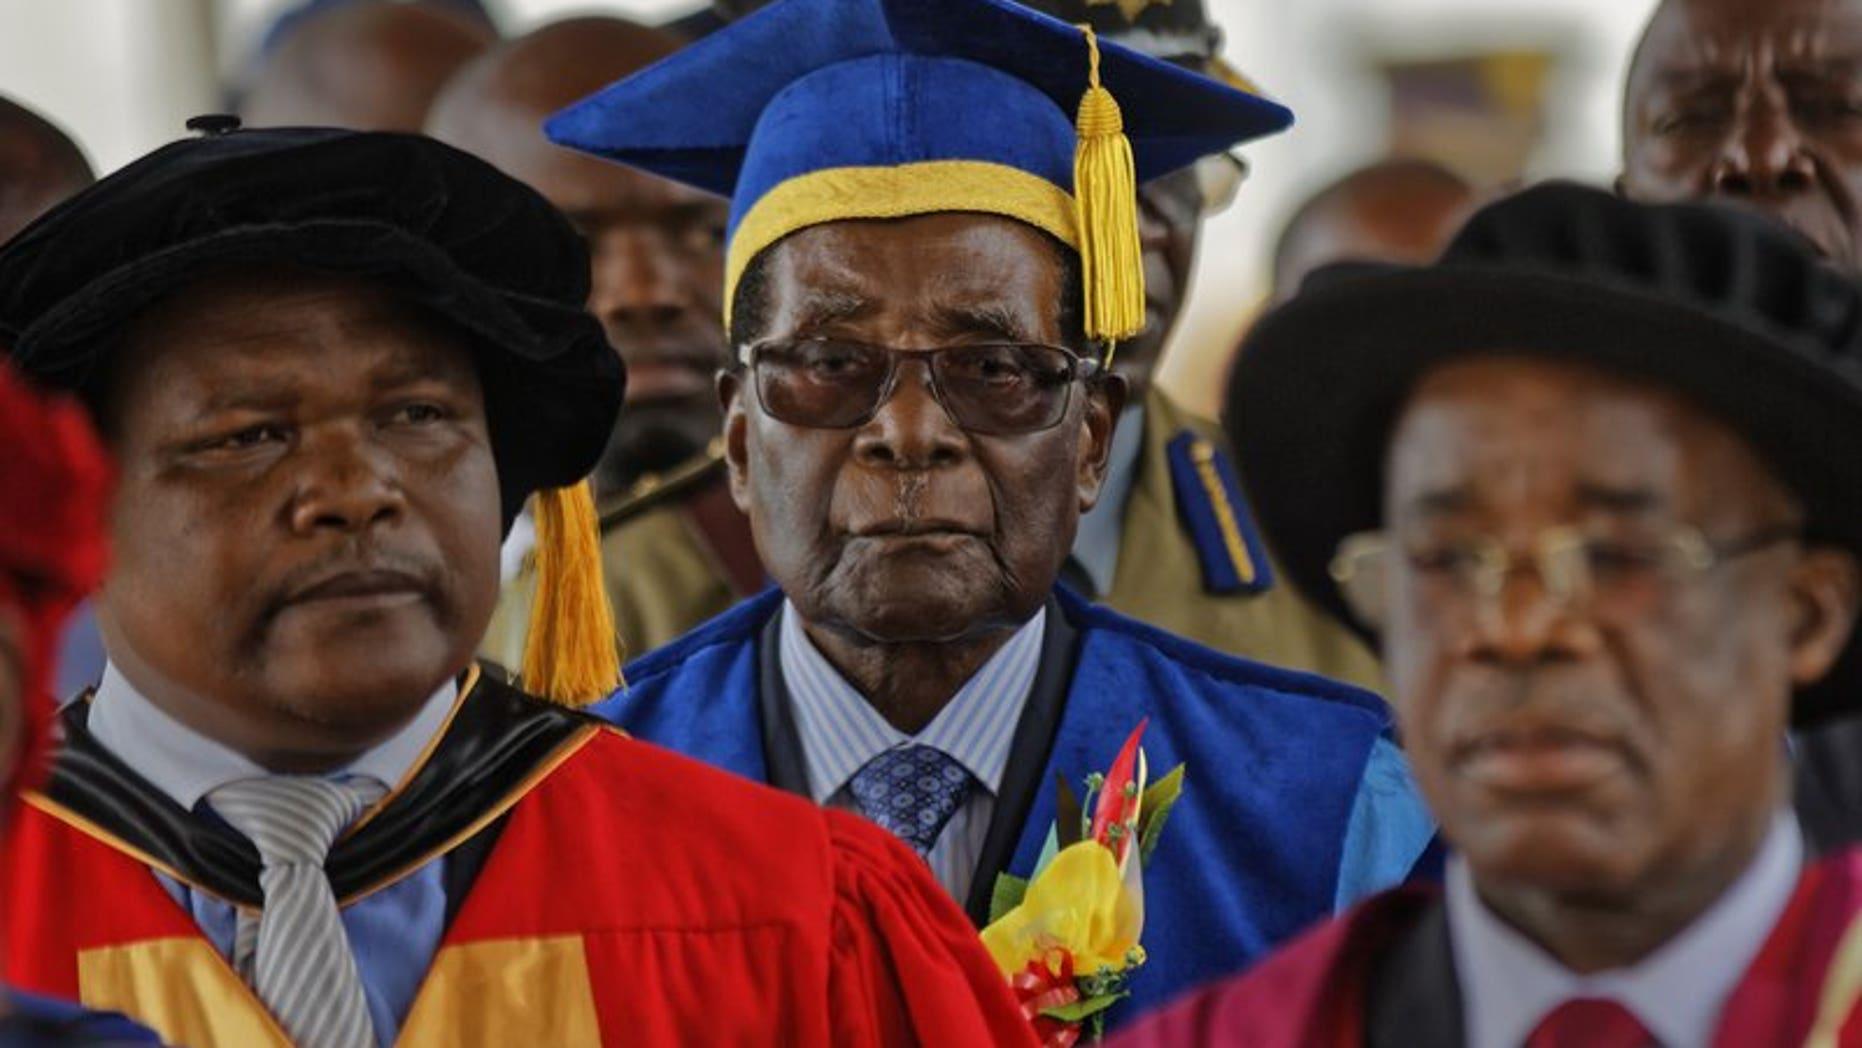 Zimbabwe's President Robert Mugabe, center, arrives to preside over a student graduation ceremony at Zimbambwe Open University, Nov. 17, 2017.